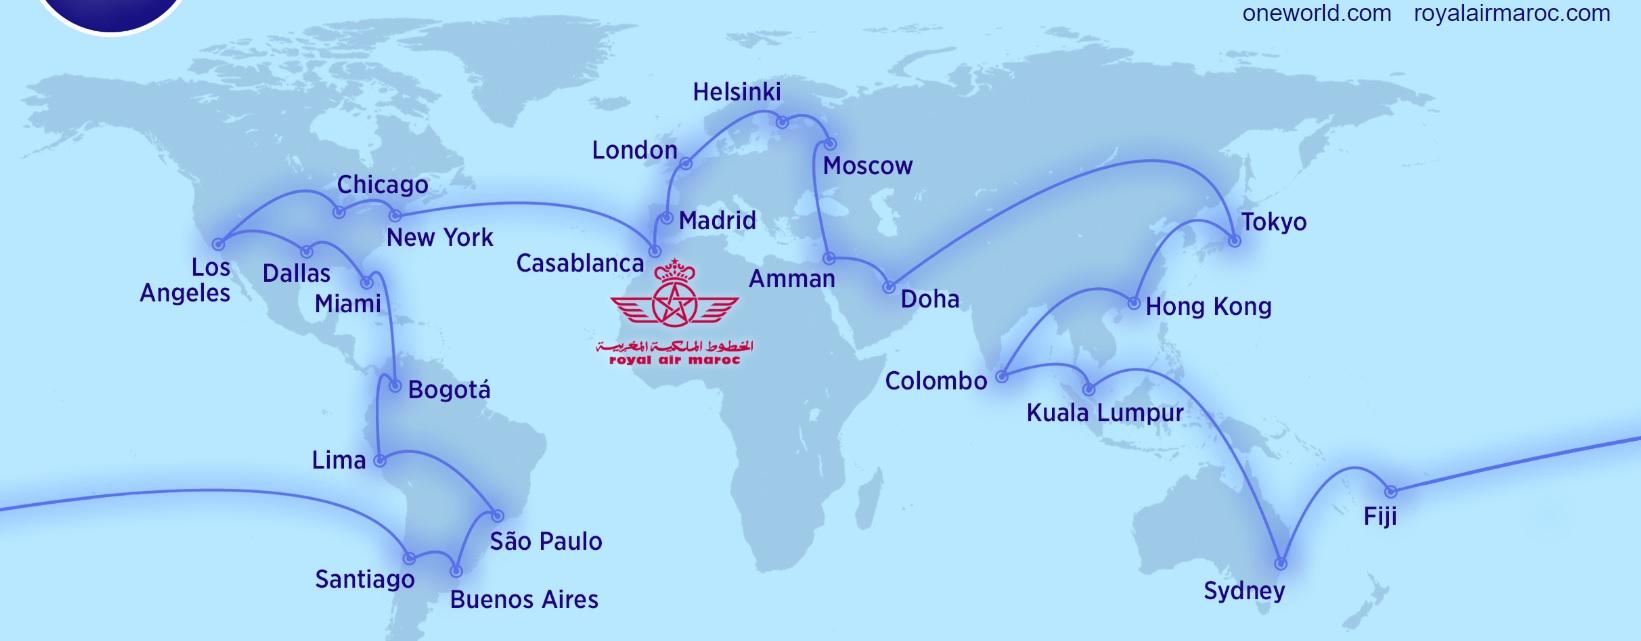 Royal Air Maroc joins Oneworld Alliance